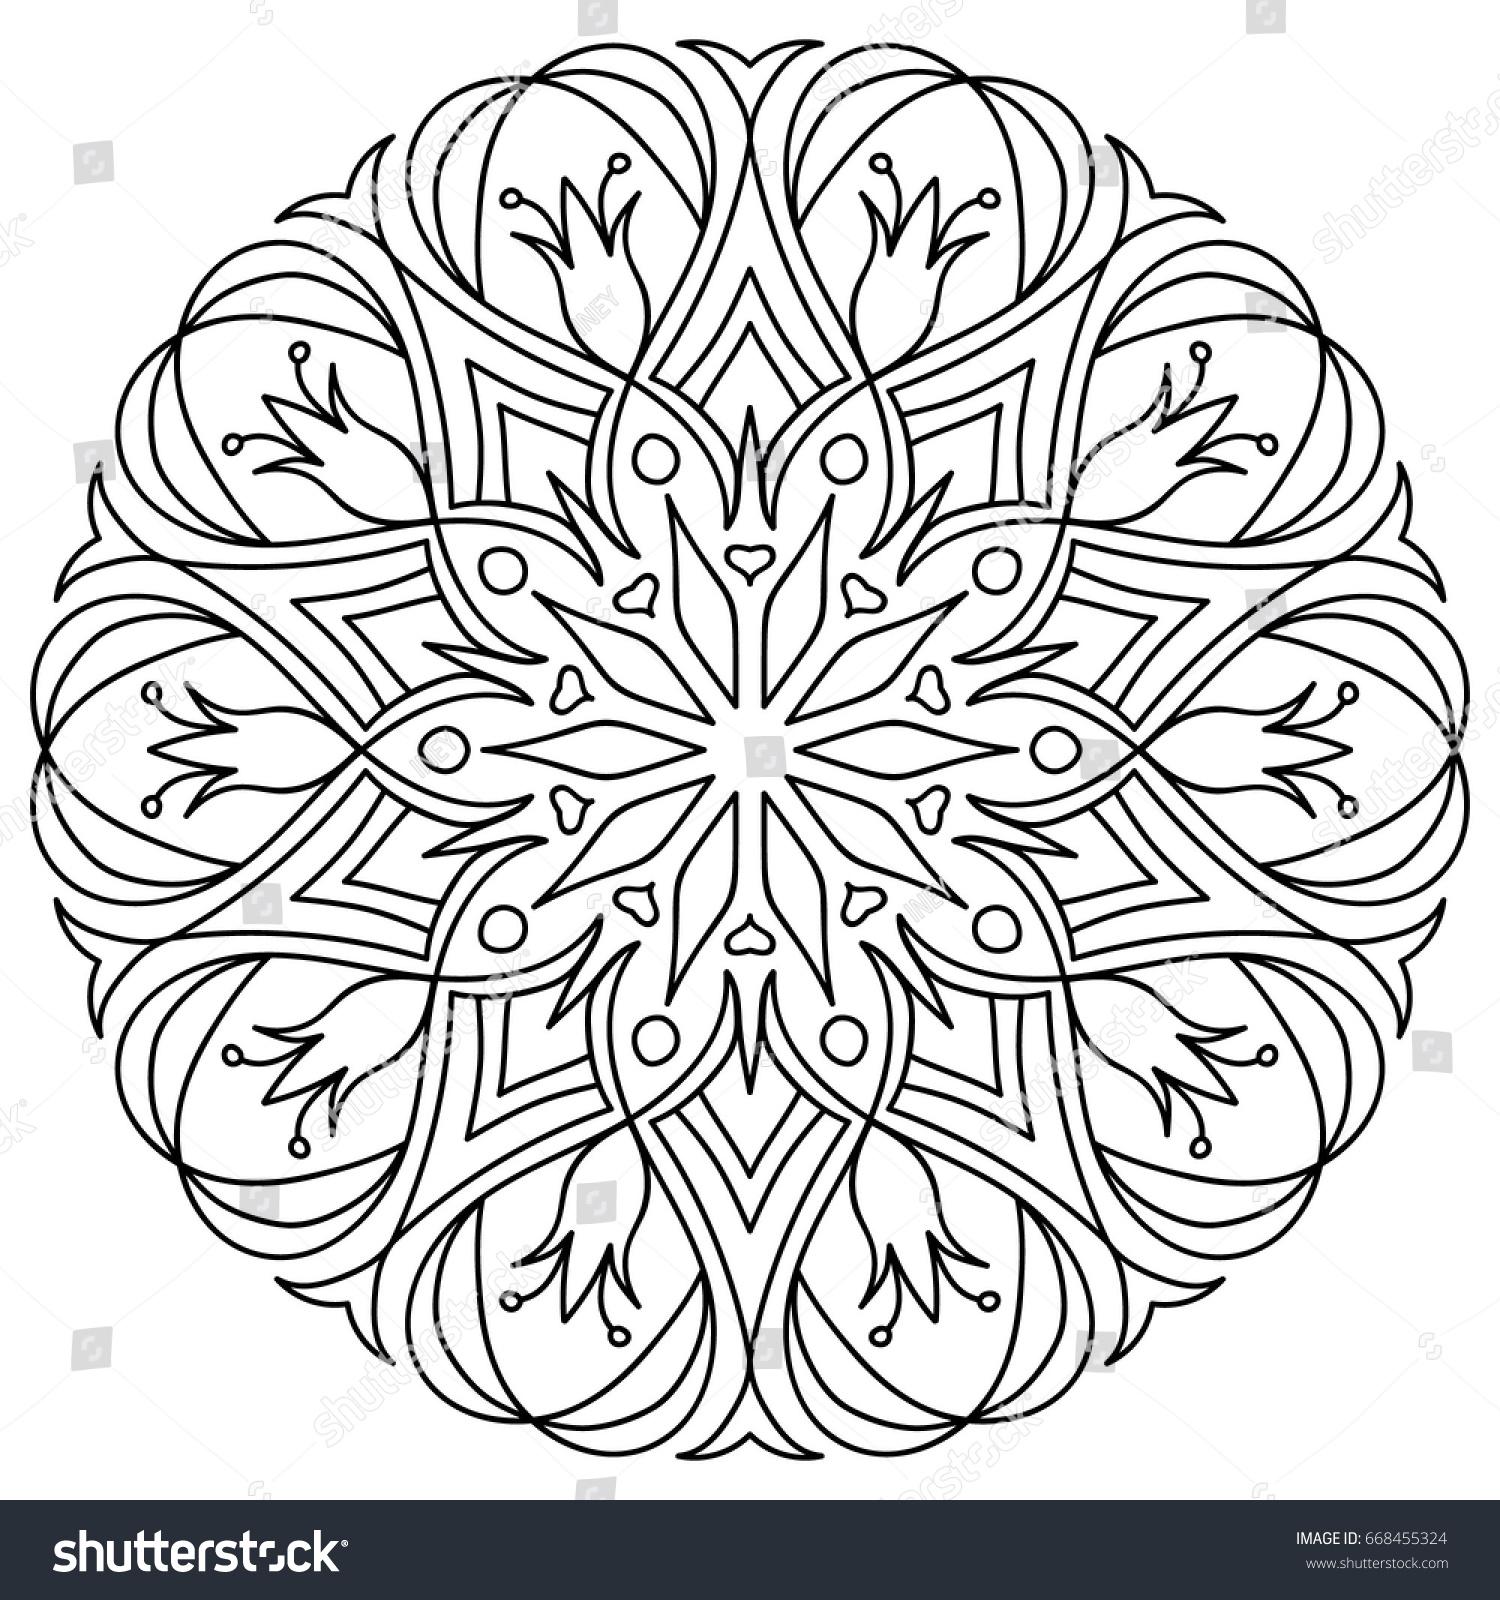 Flower Mandala Decorative Round Ornaments Anti Stress Therapy Patterns Weave Design